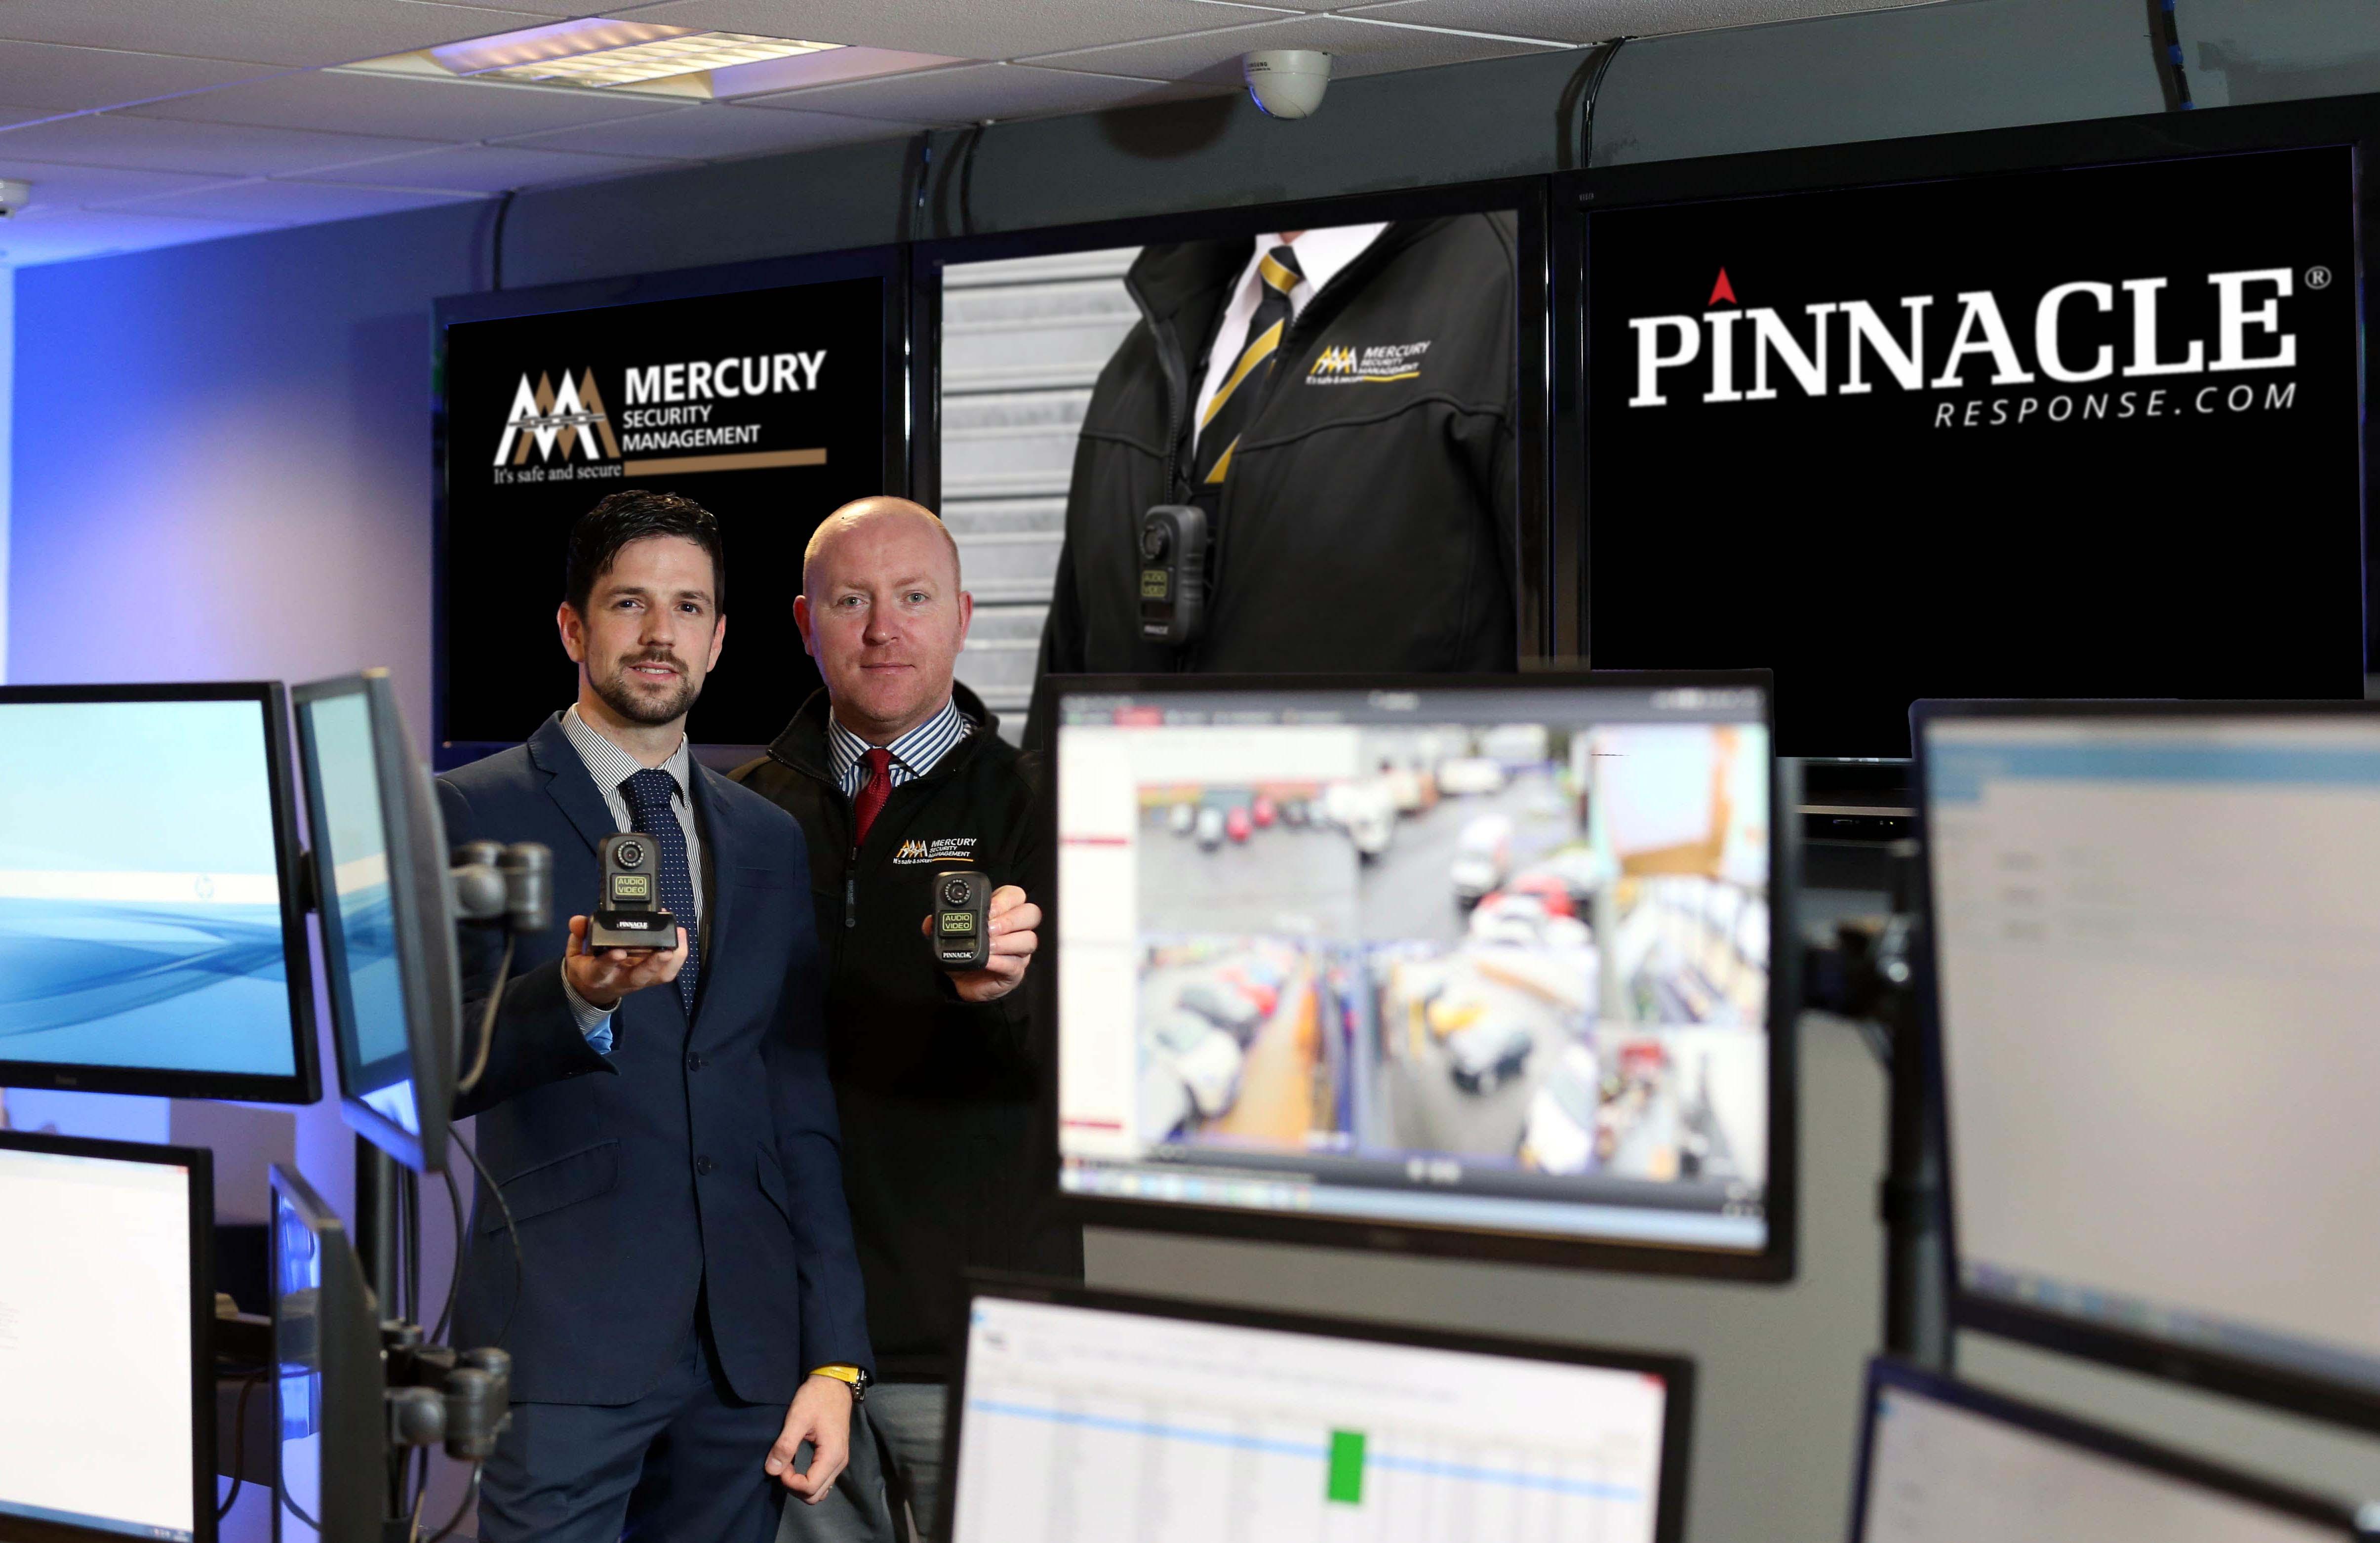 New deal sees Mercury reach the Pinnacle of camera surveillance